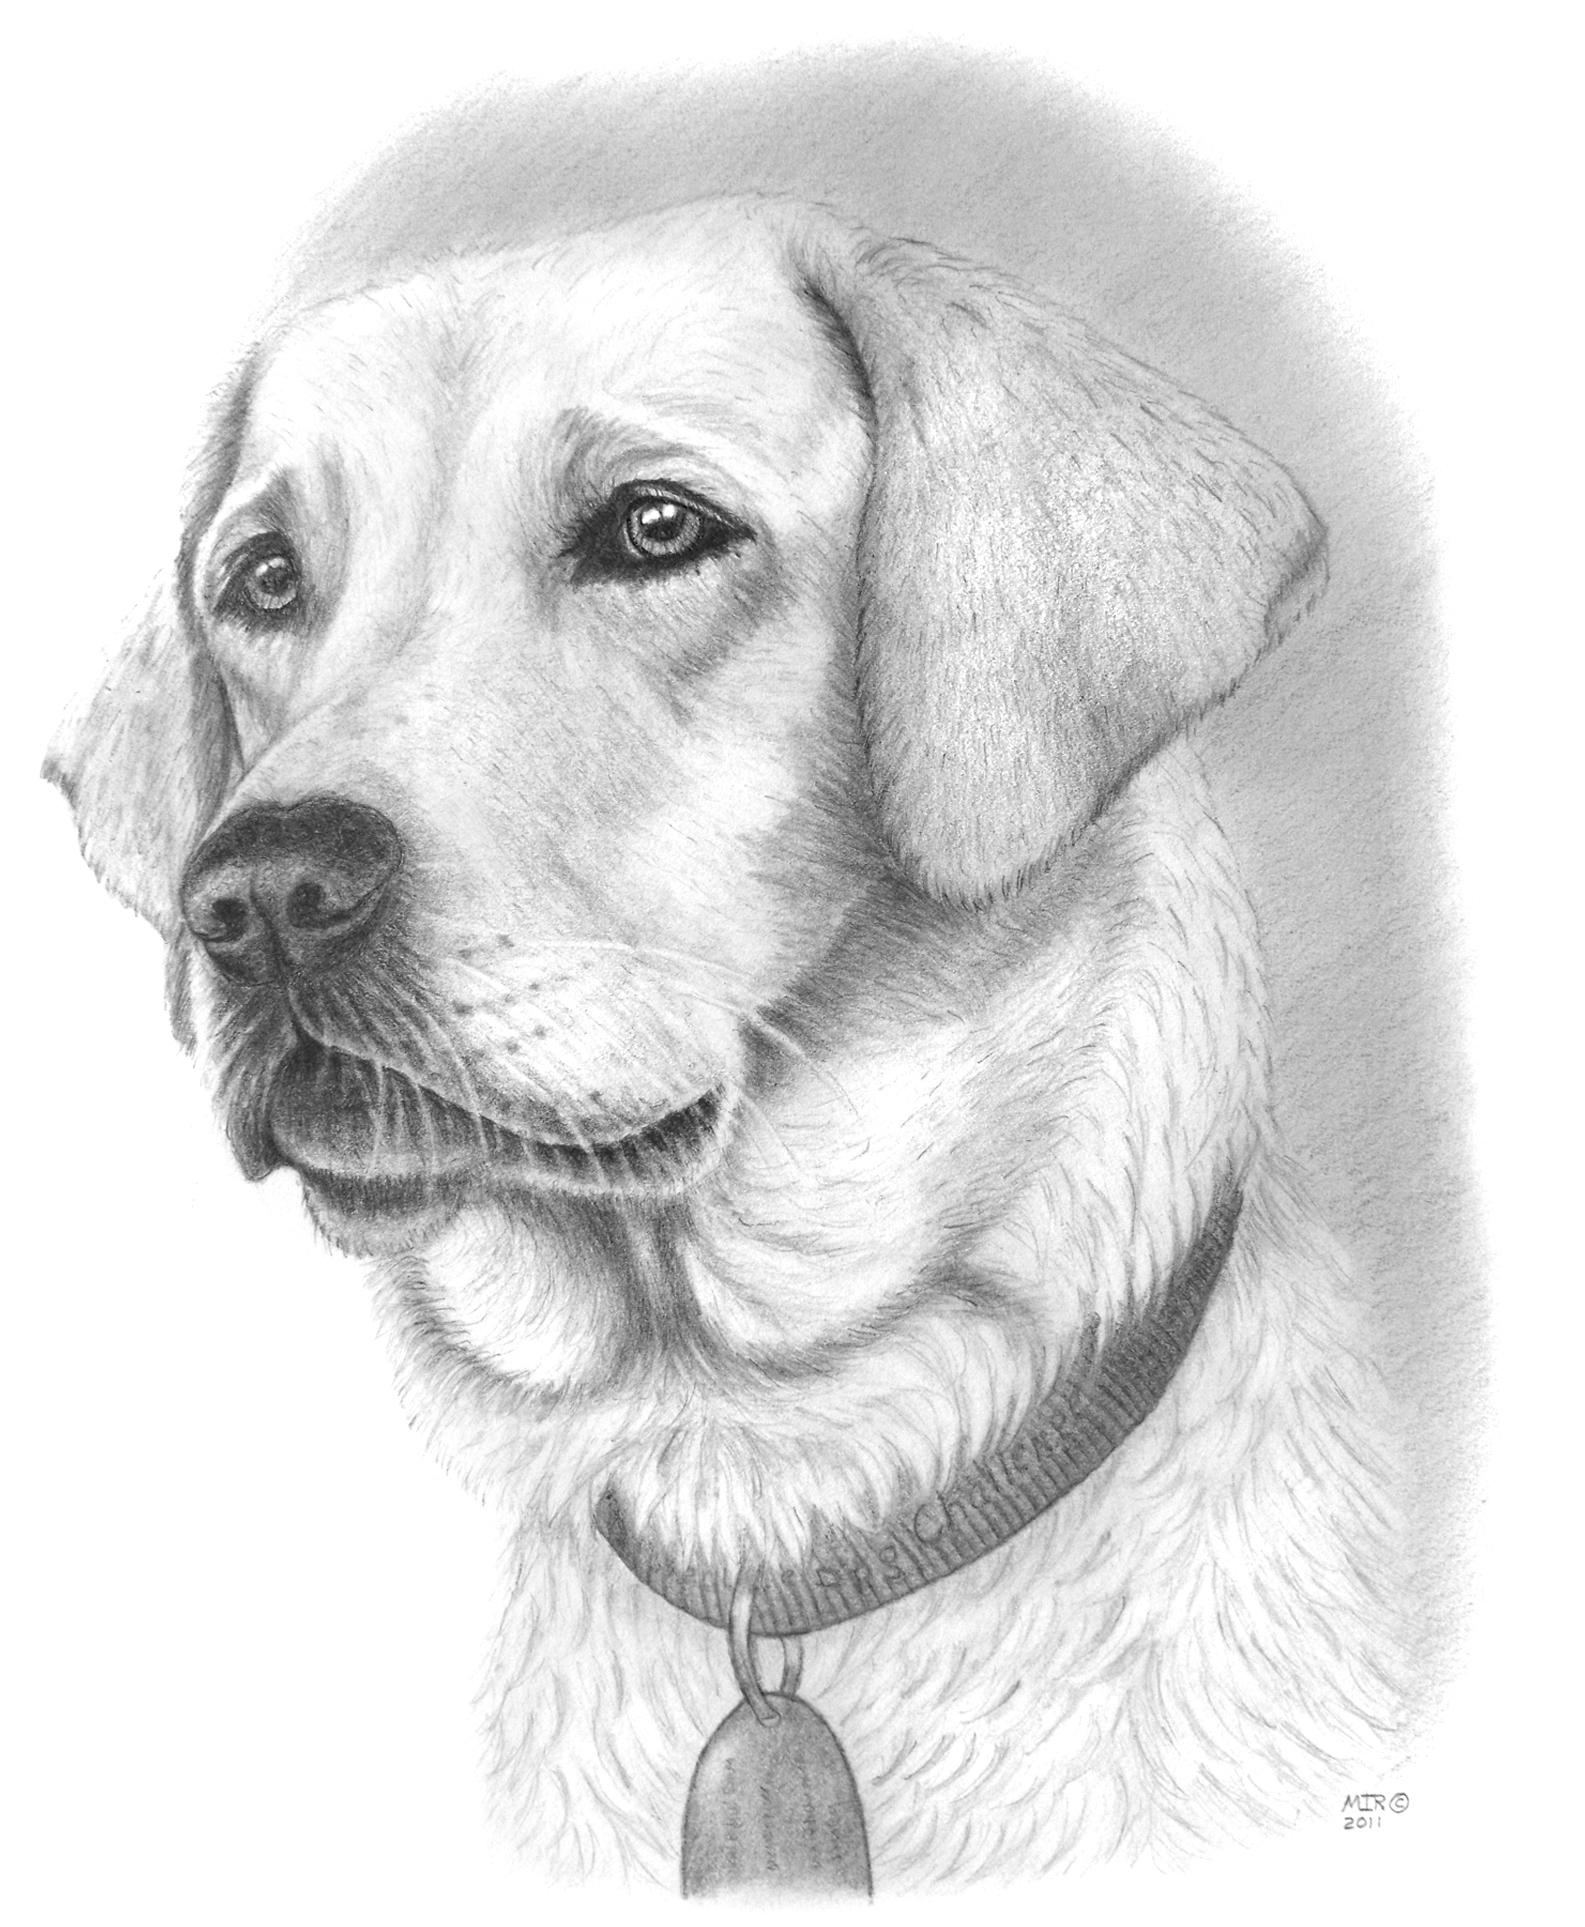 Drawn portrait detailed Dog Art Dog Pinterest Pop